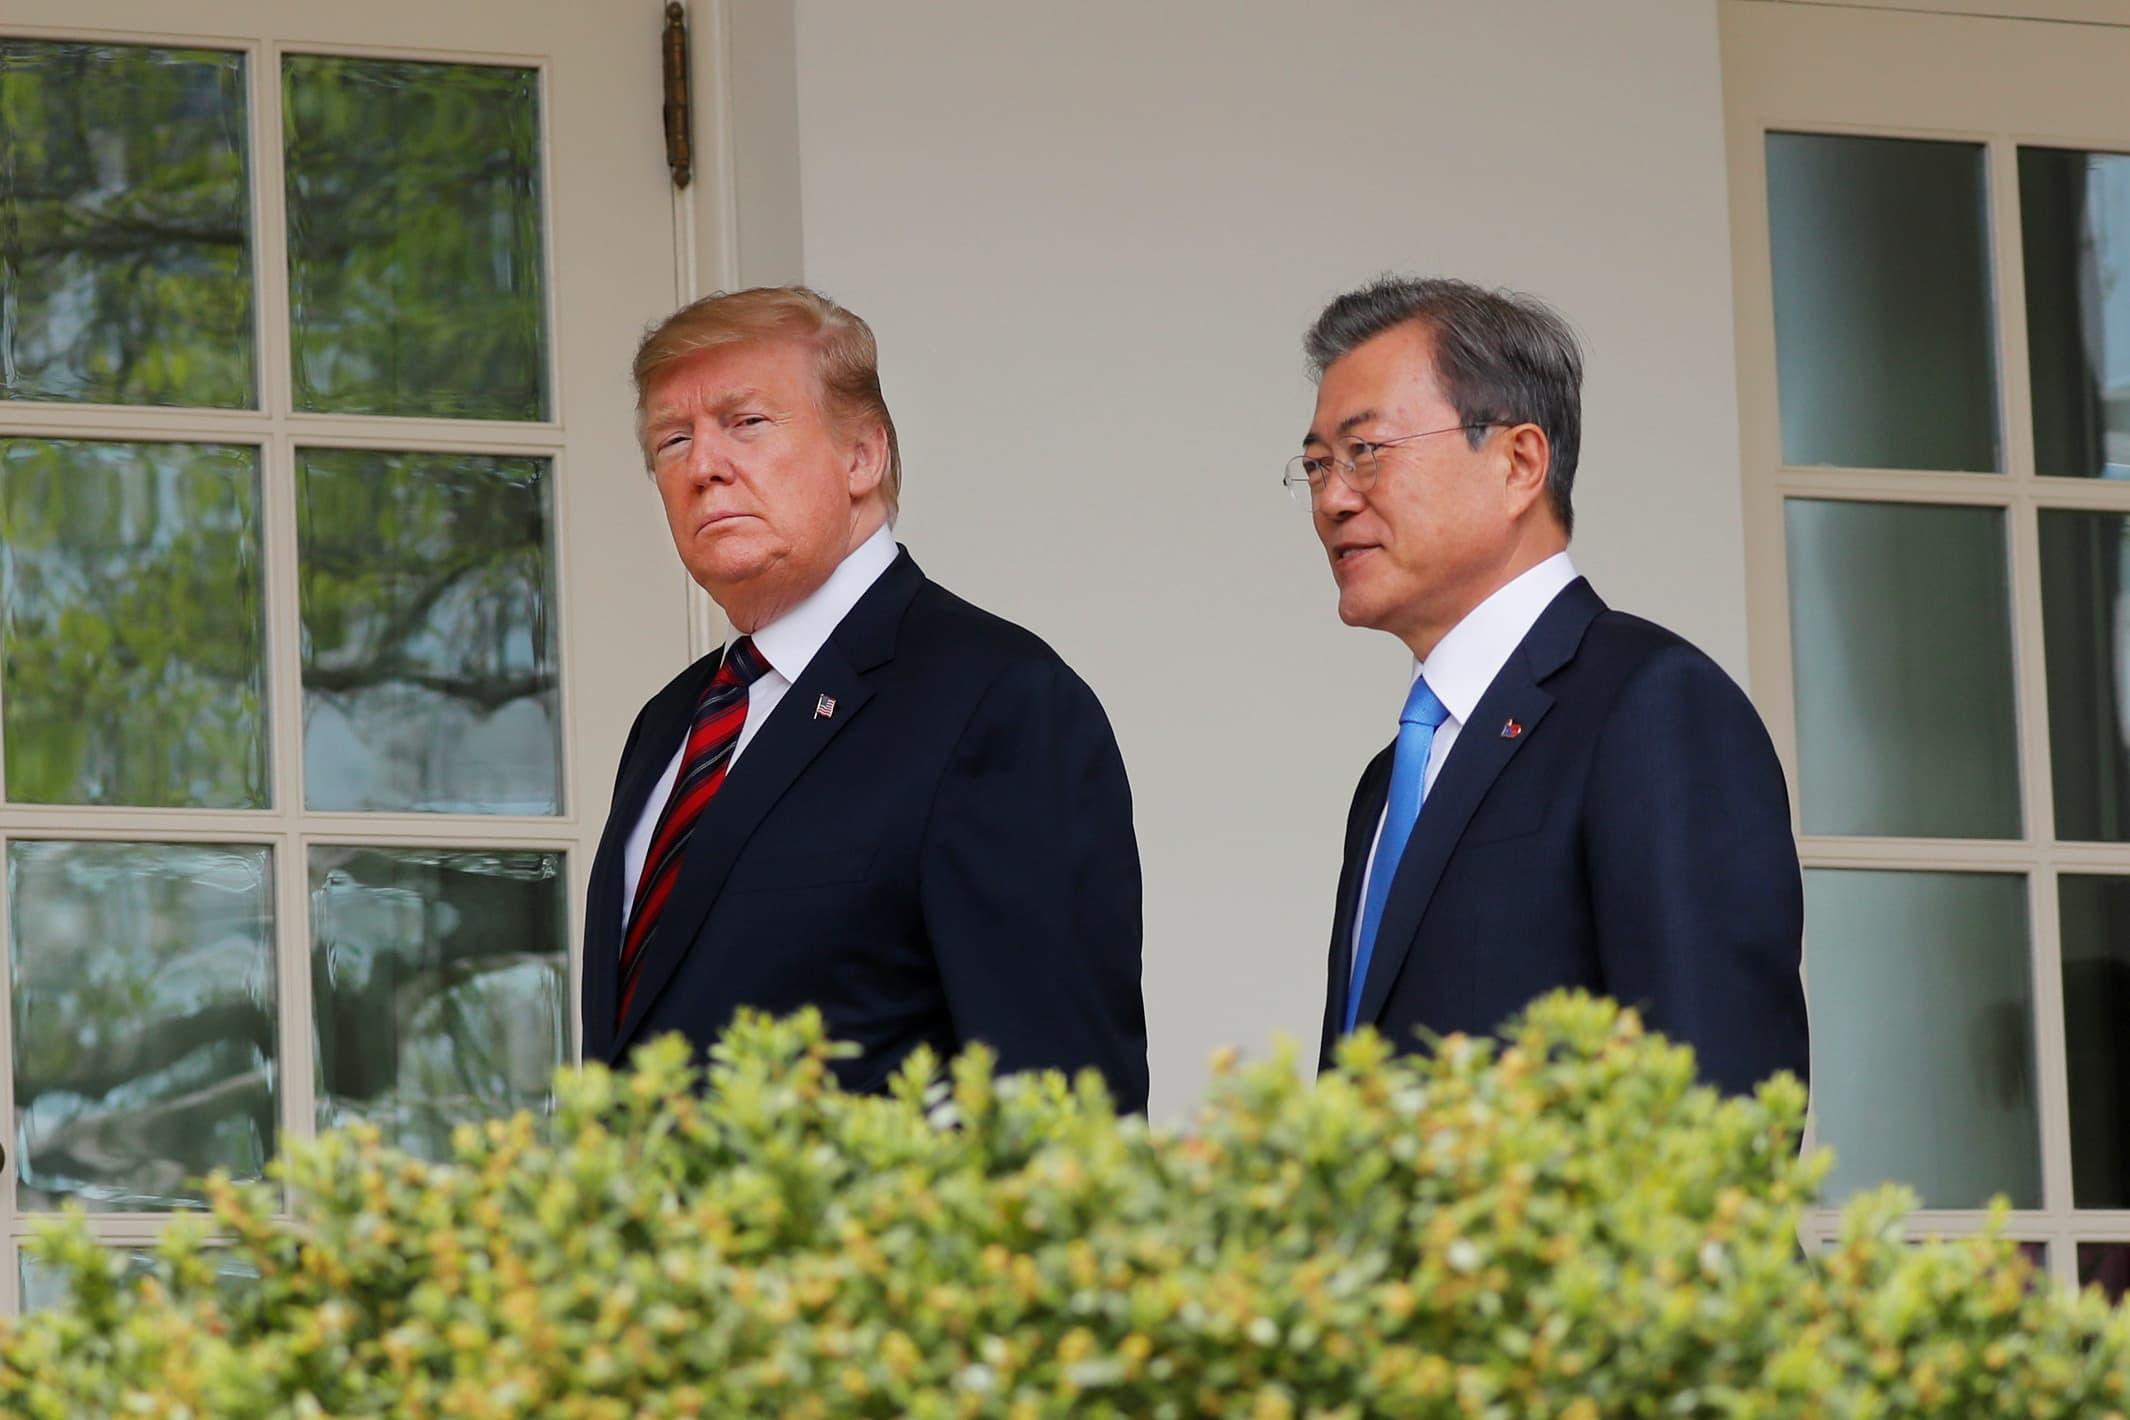 Trump to meet with South Korean leader Moon Jae-in amid stalled North Korea nuclear talks